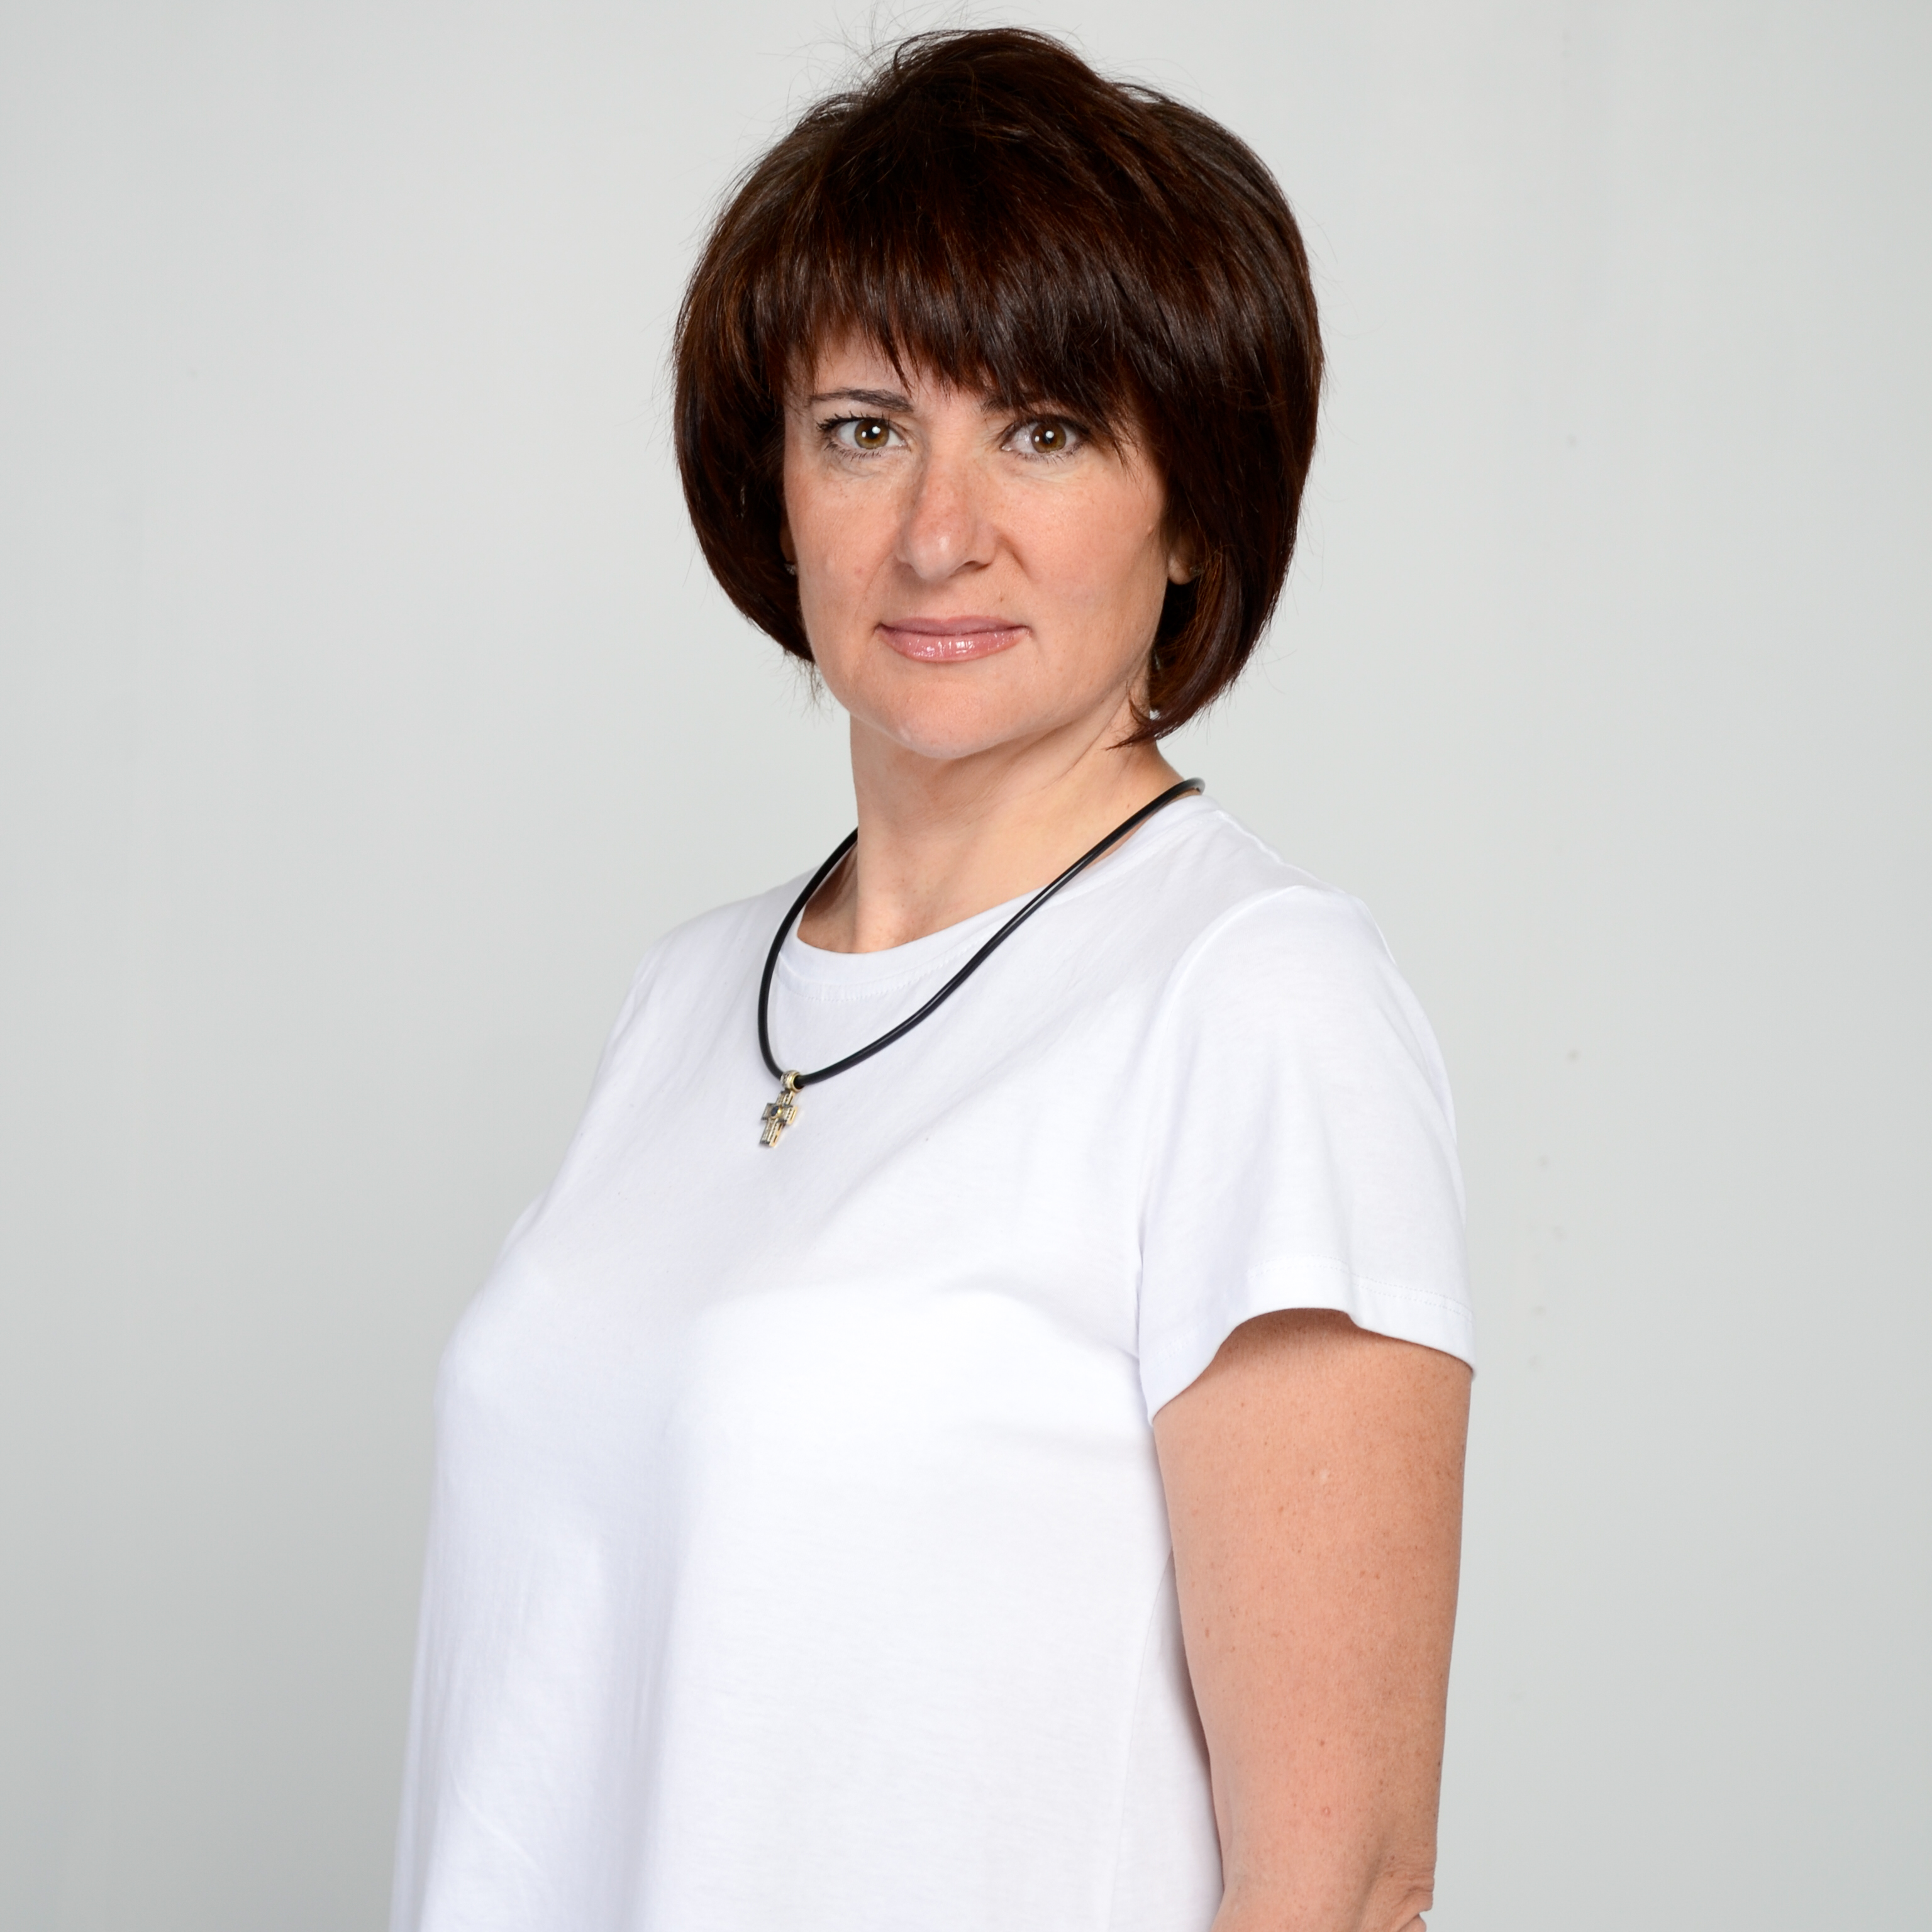 Margarita Khazina